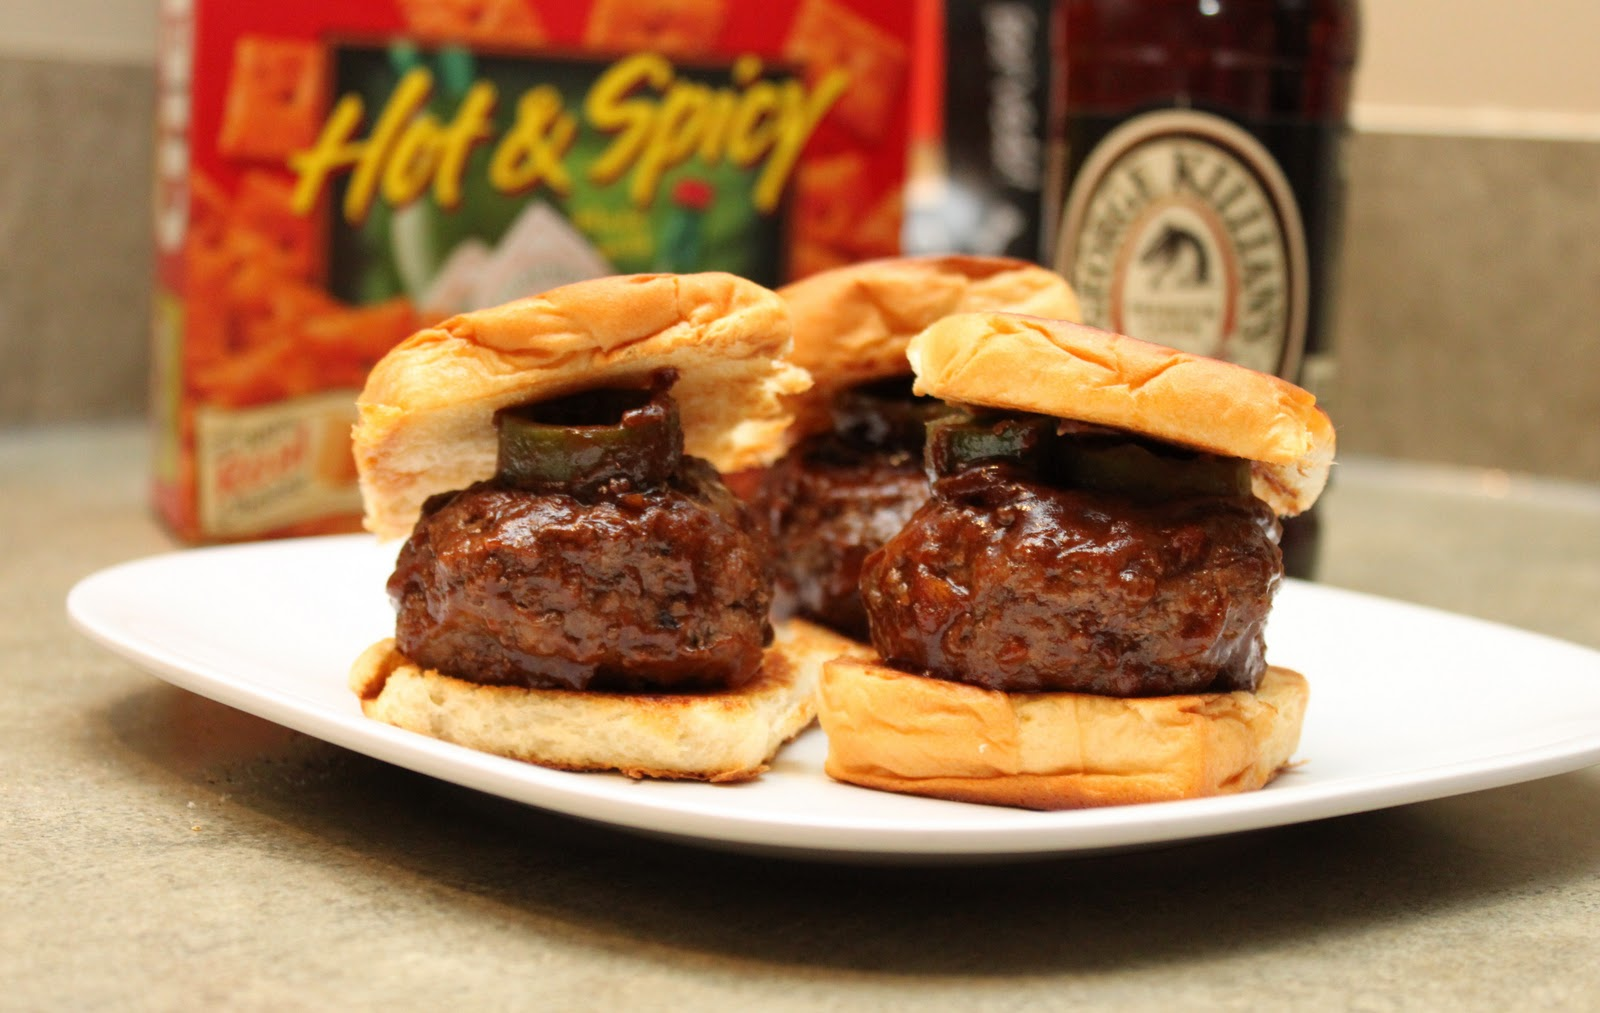 Jack Daniel's Spicy BBQ Sliders